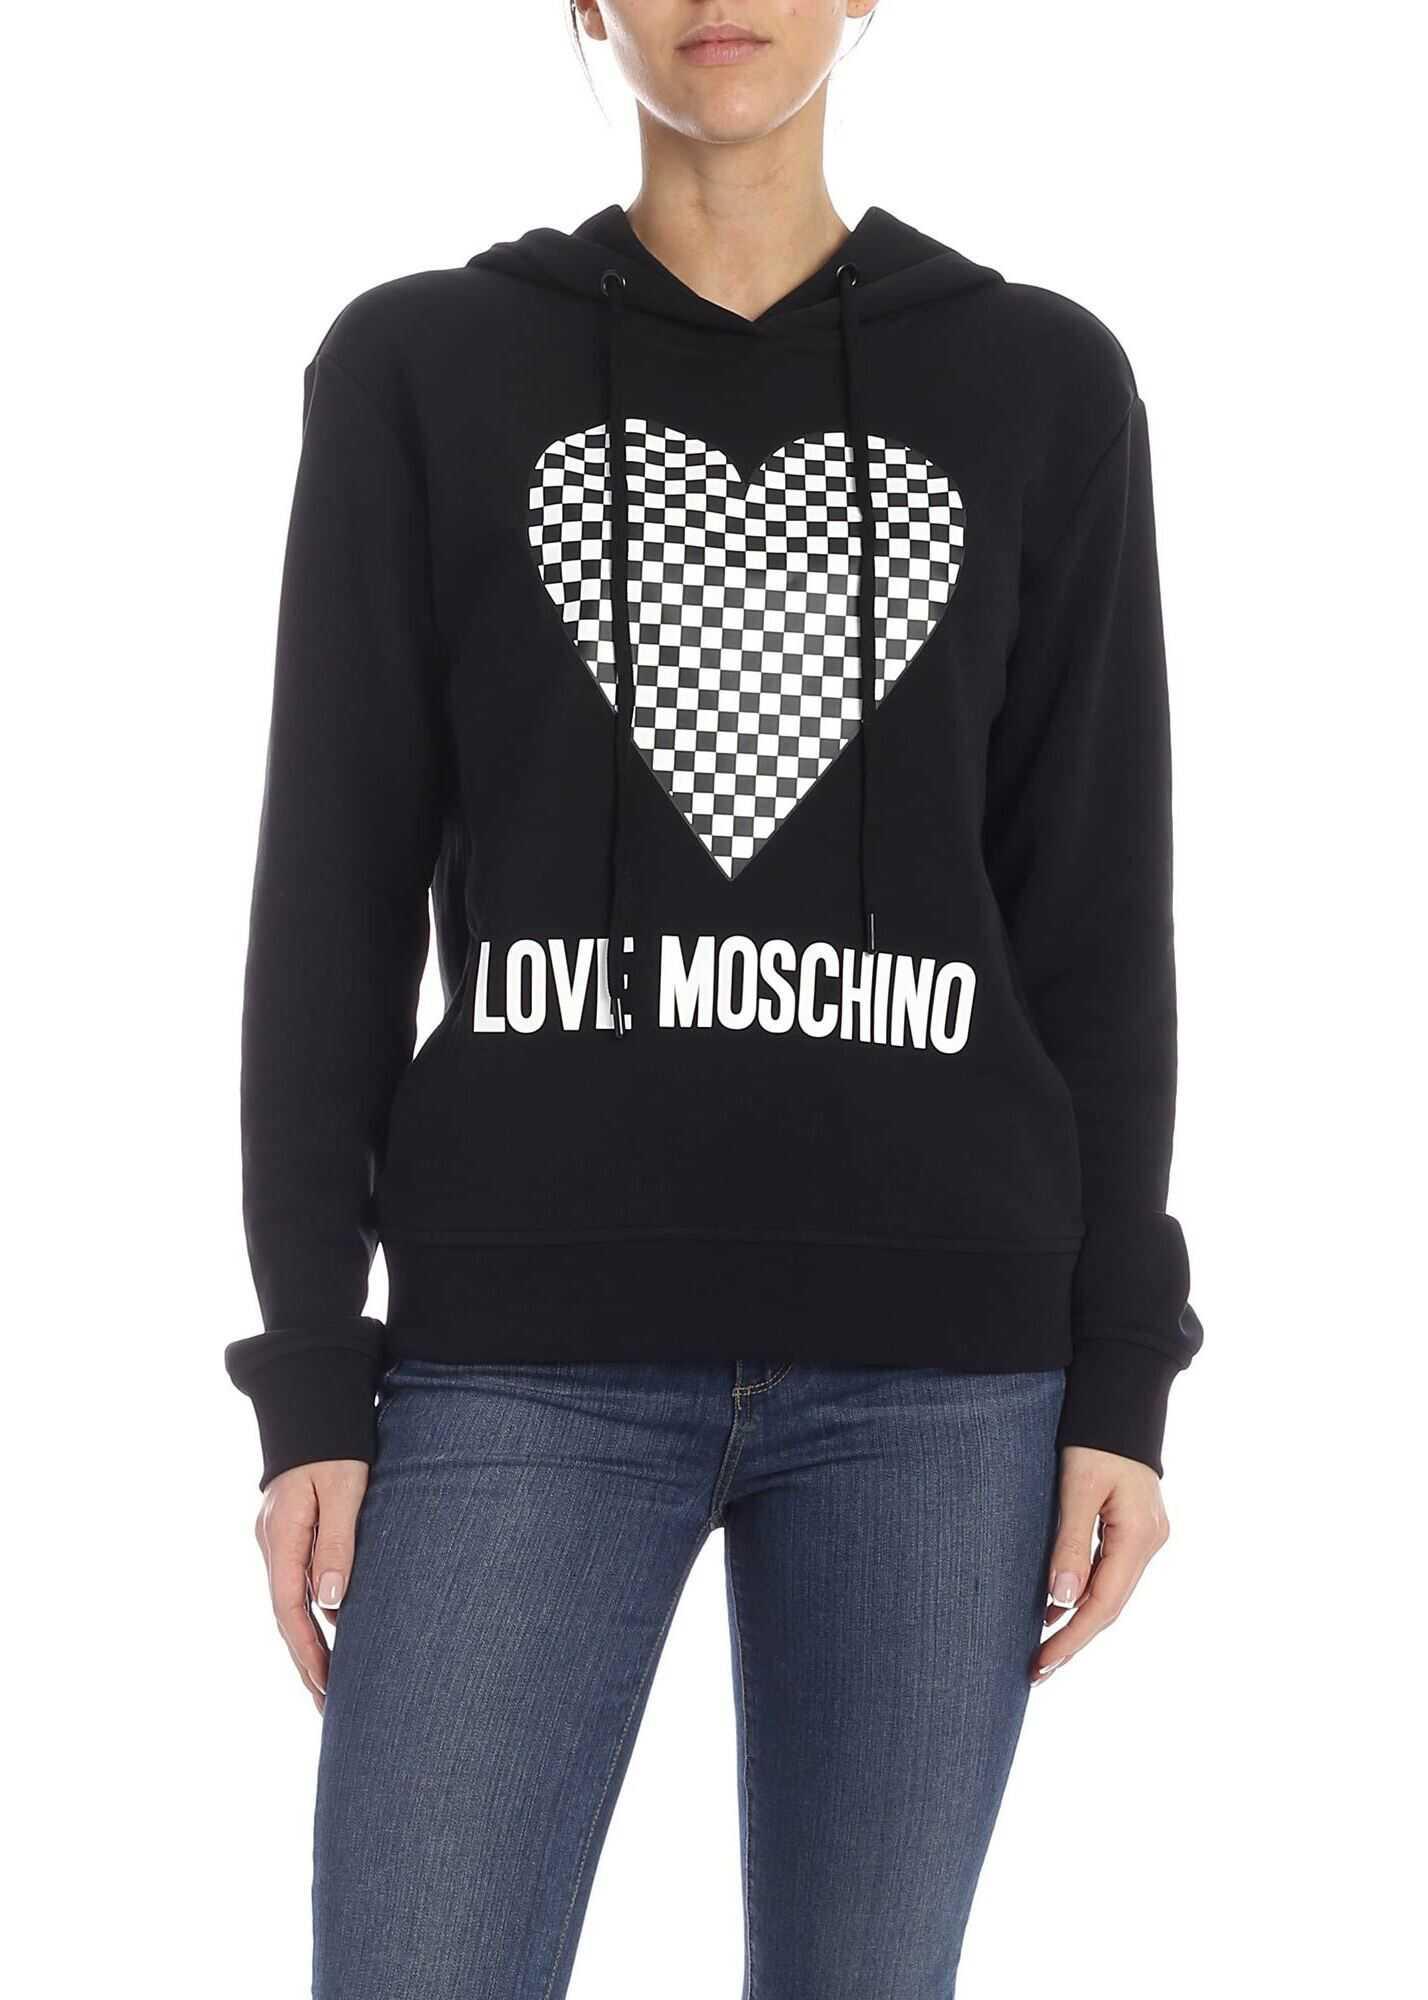 LOVE Moschino Sweatshirt In Black With Checkered Logo Black